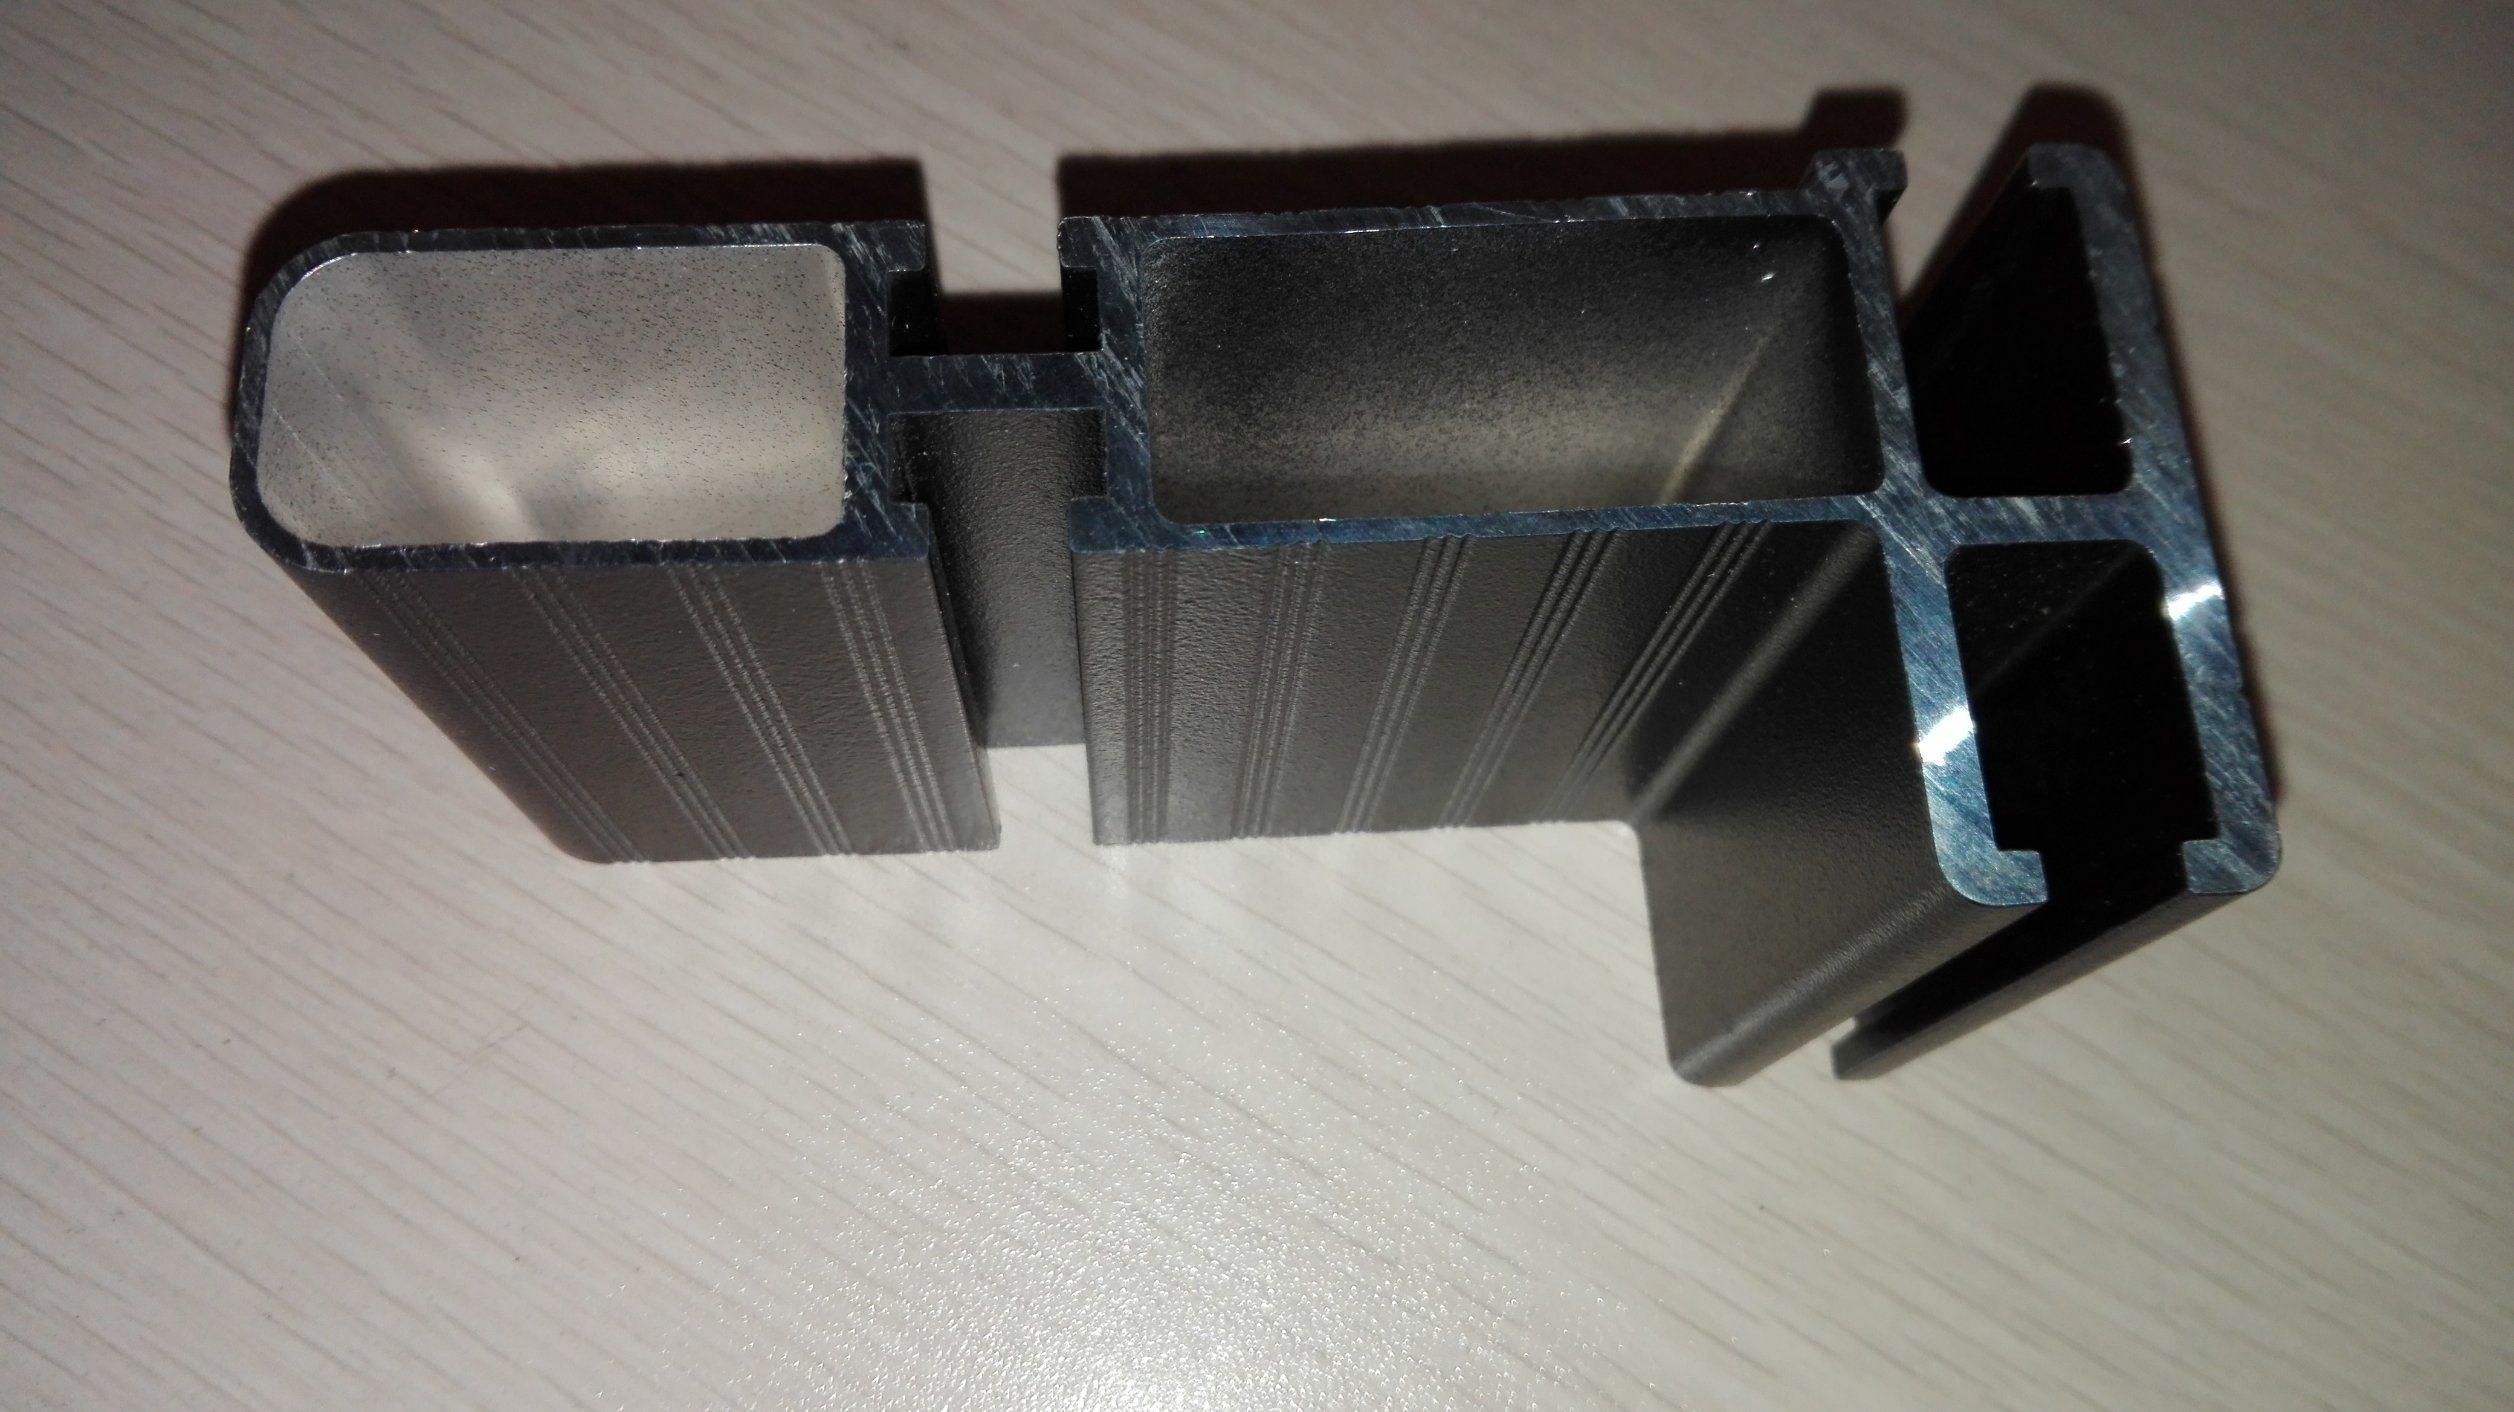 Aluminium Extrusion for SUV Frame